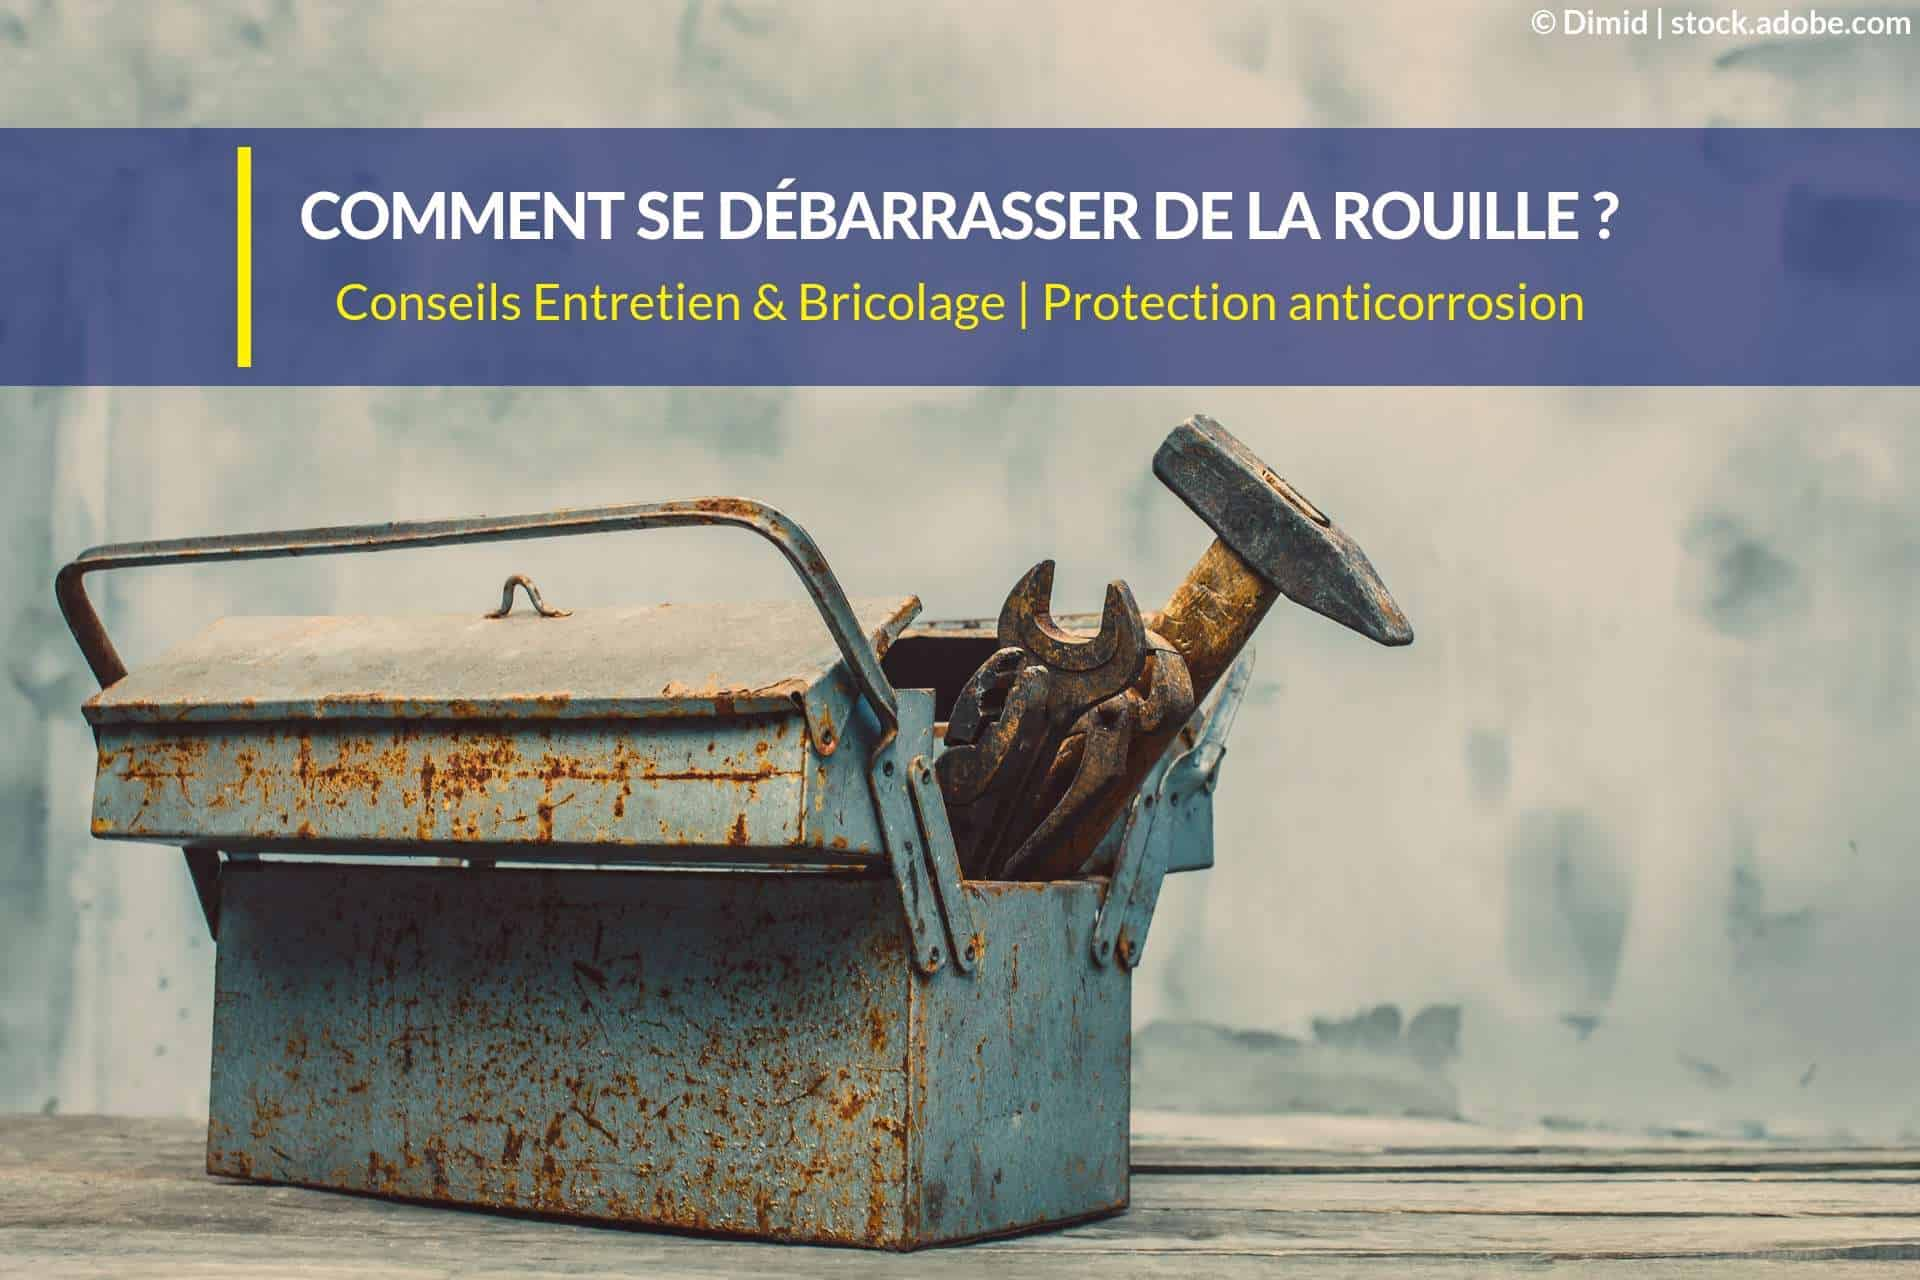 Enlever Rouille Sur Plancha En Fonte tout nettoyer: nettoyer rouille fonte